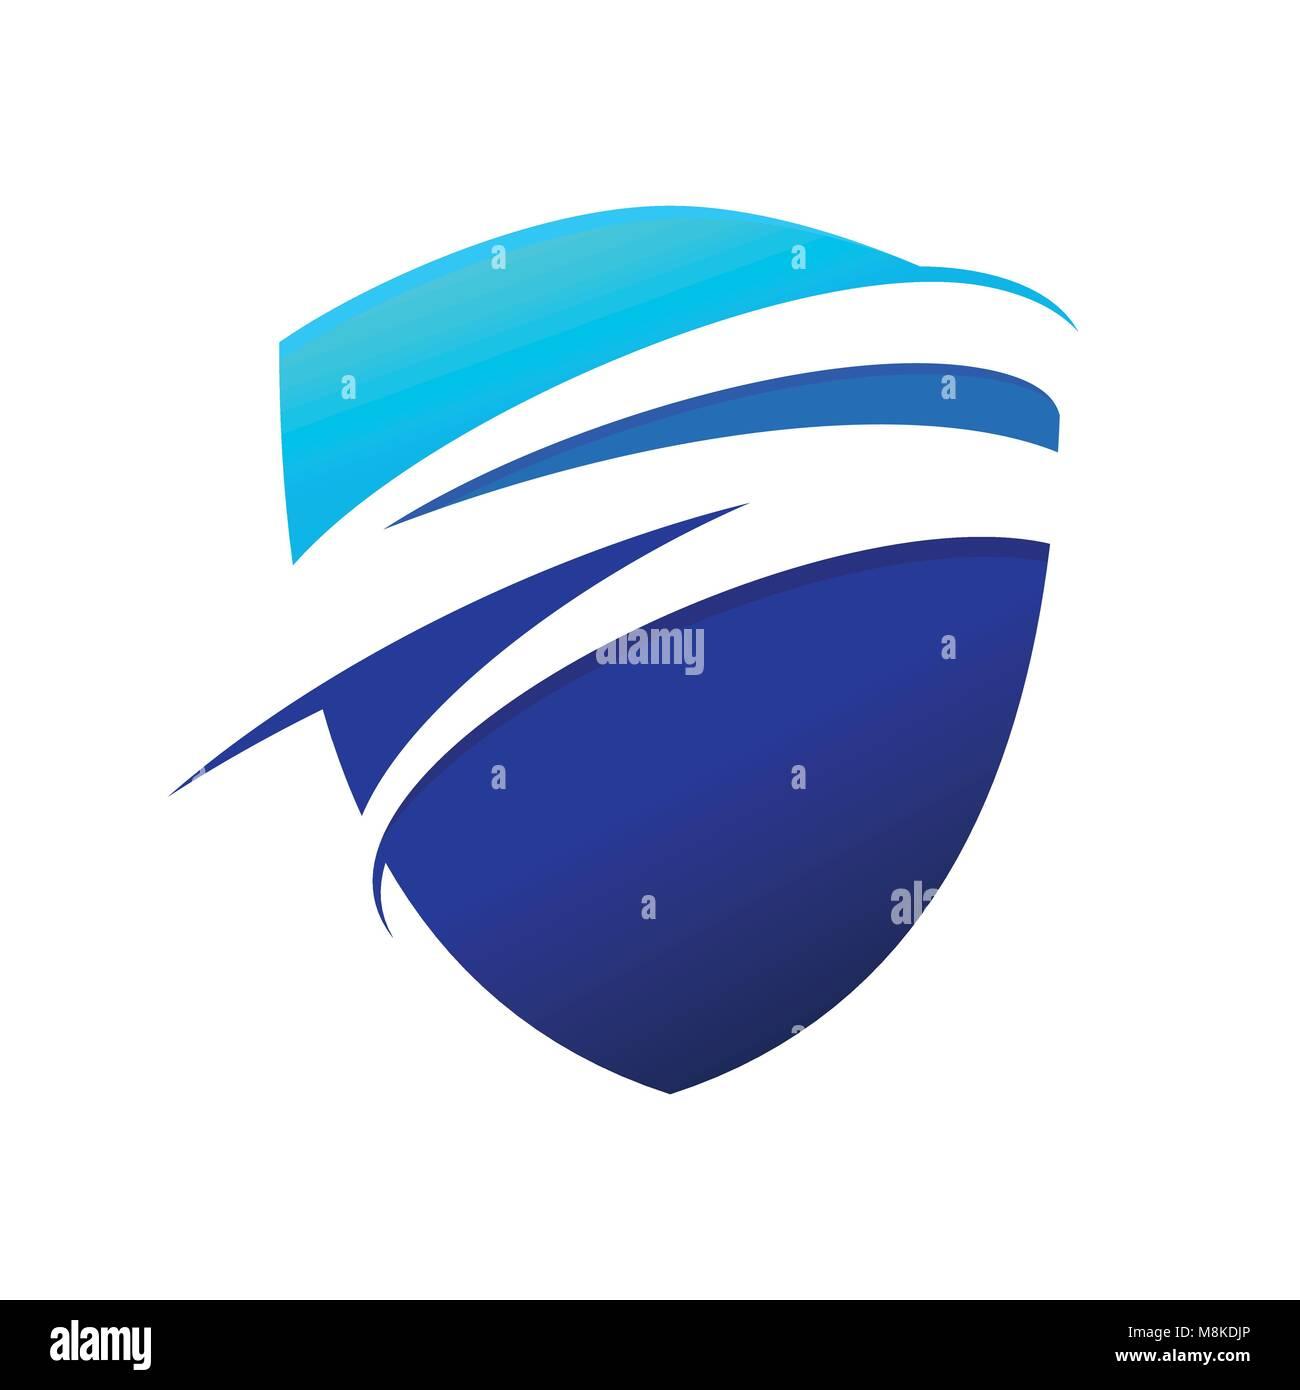 Blue Wave Swoosh Modern Shield Vector Symbol Graphic Logo Design - Stock Image